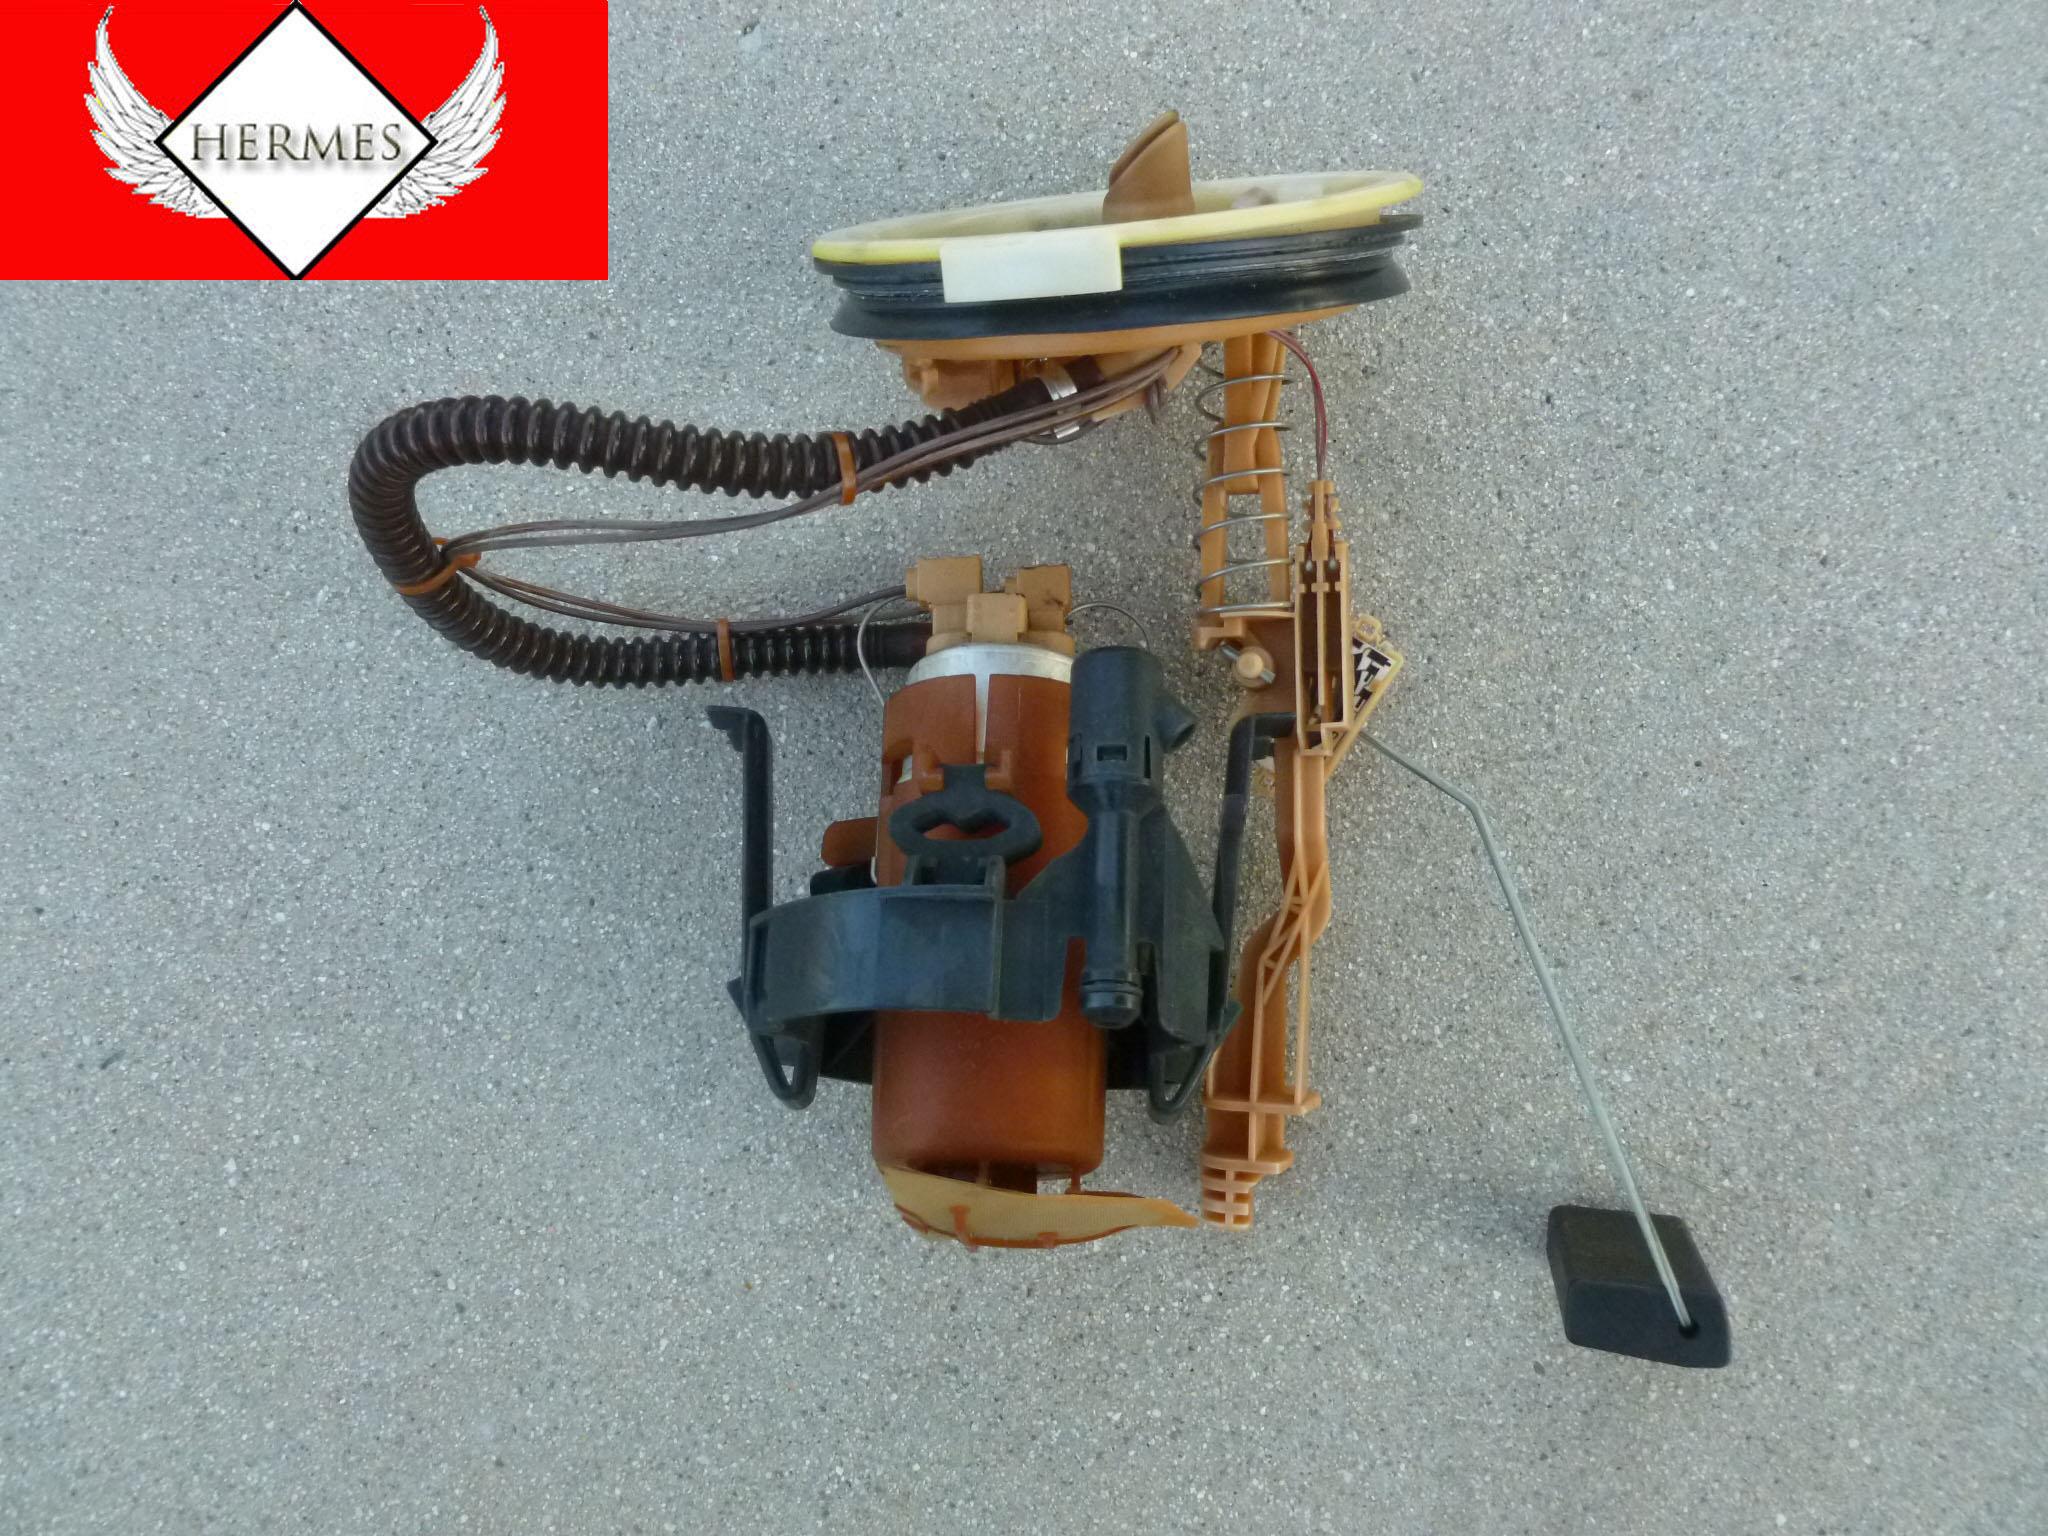 1997 Bmw 528i E39 Fuel Pump Assembly 1183130 Hermes Auto Parts